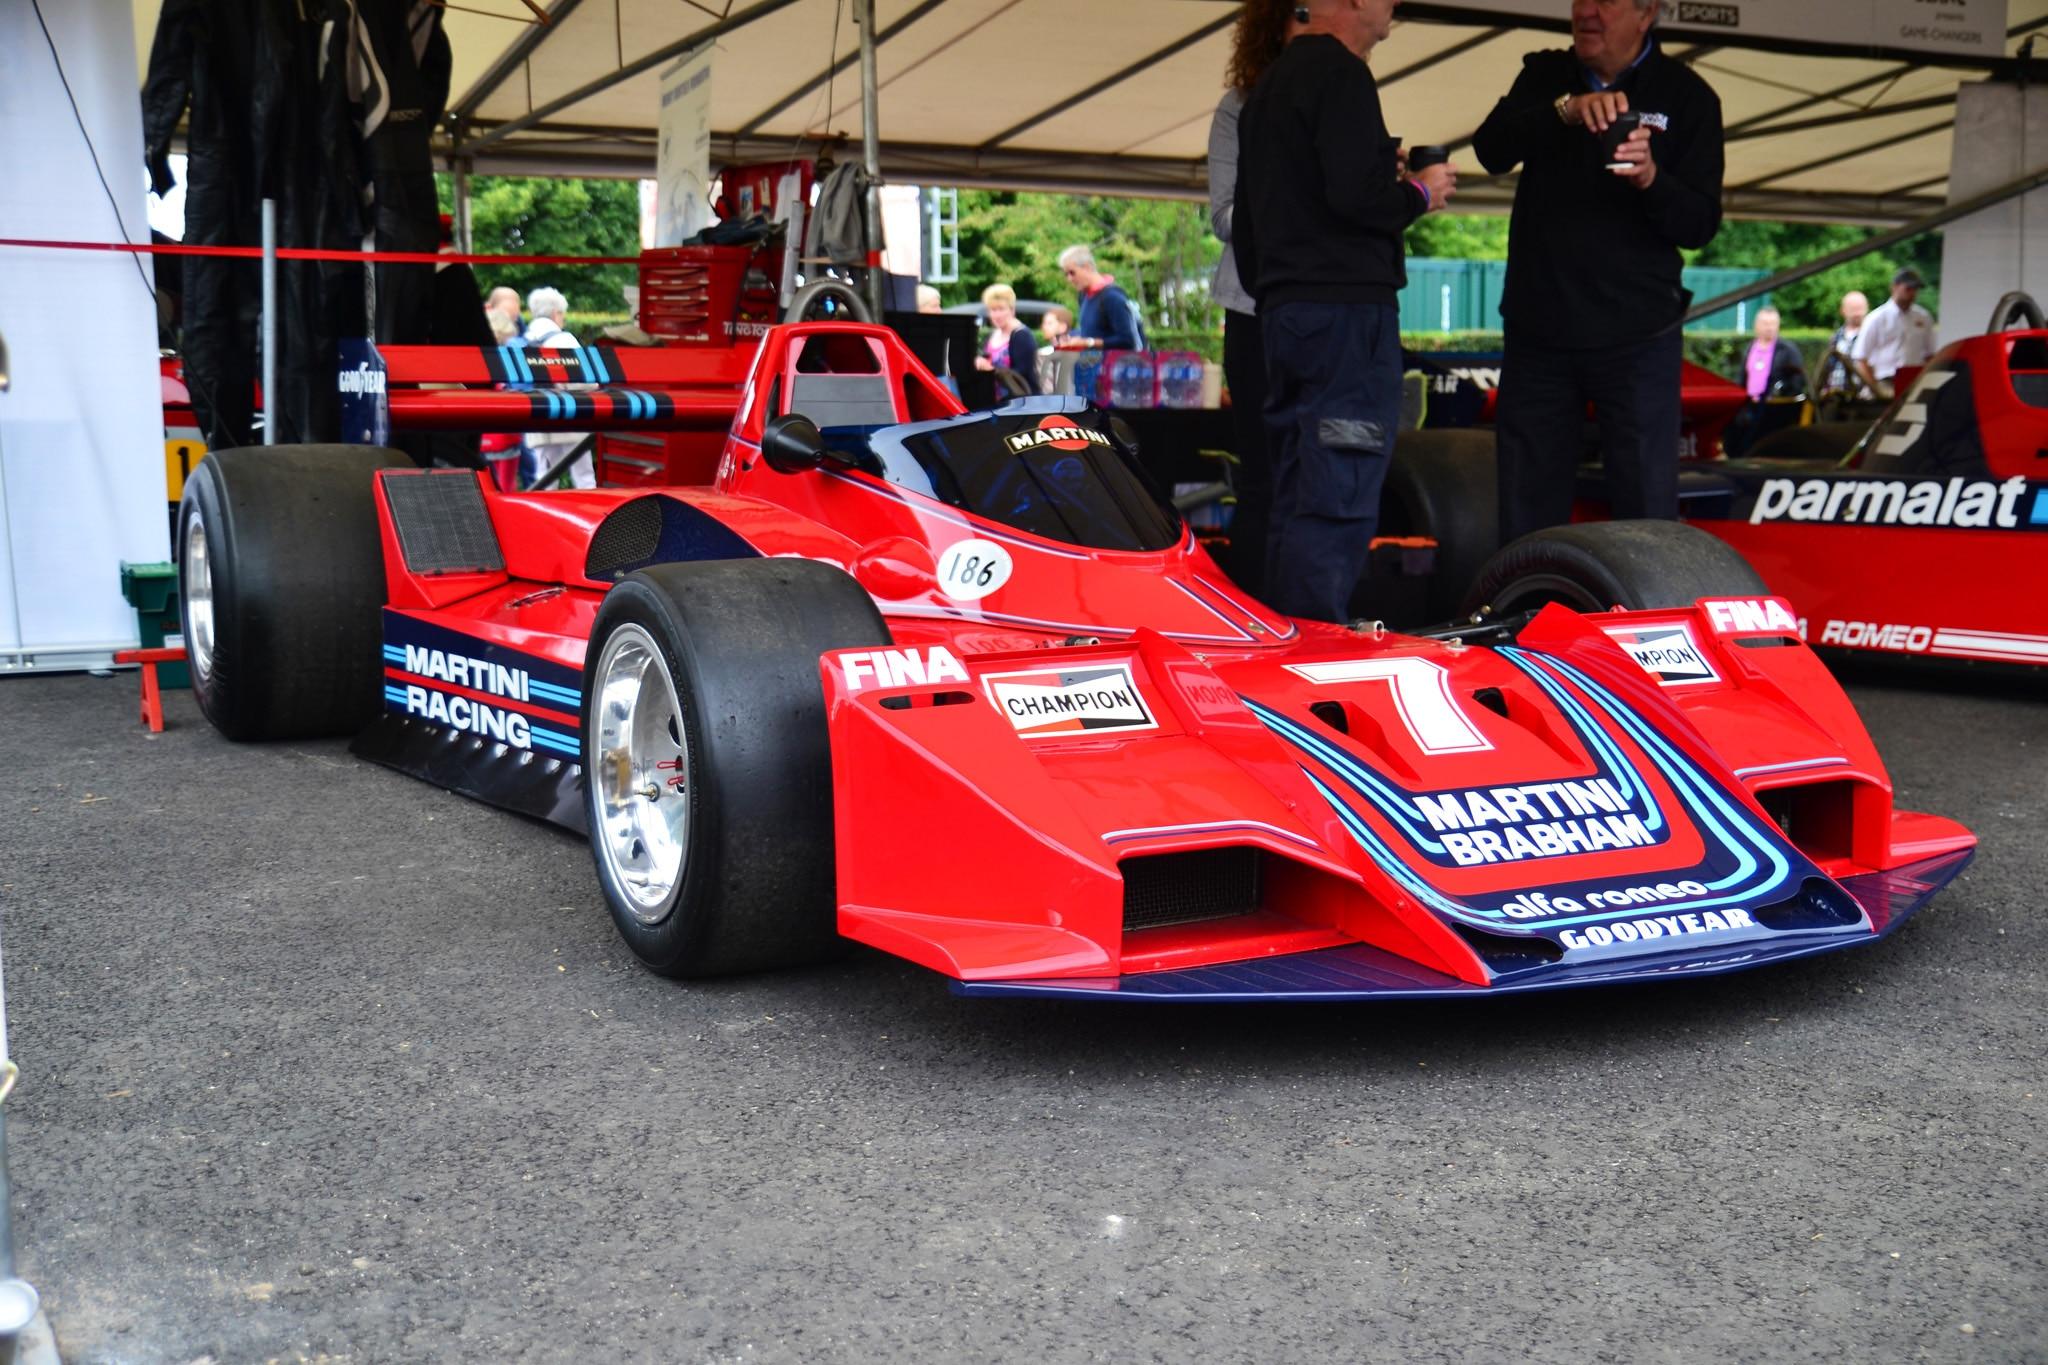 1976 Brabham BT45